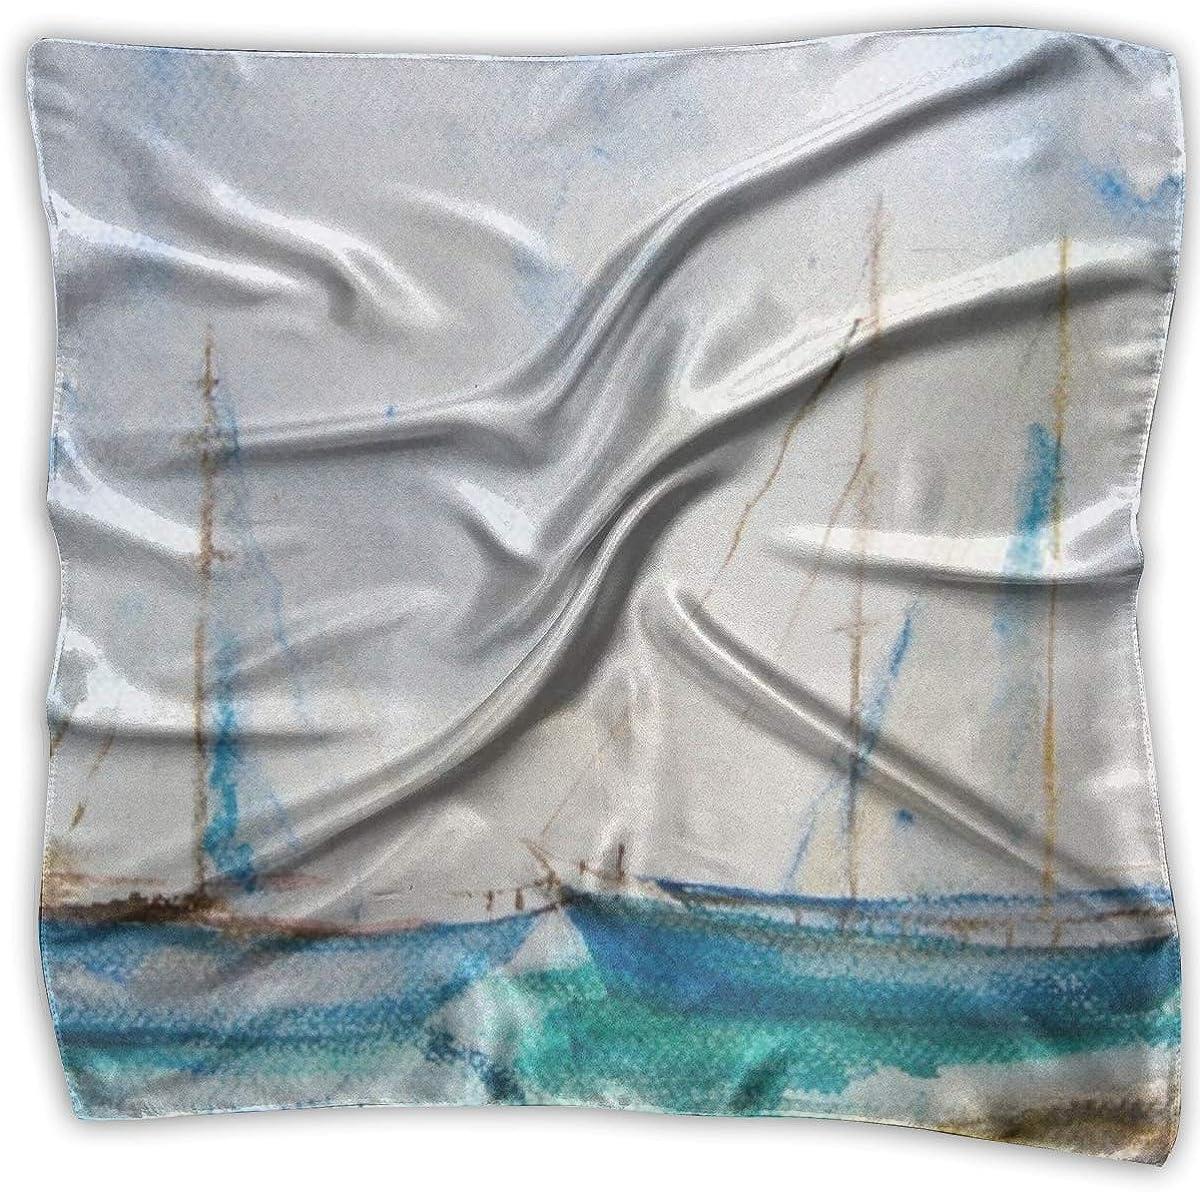 Womens Silk Scarf Millions Of Starfish Printed Square Scarf Sunscreen Shawls 39 X 39